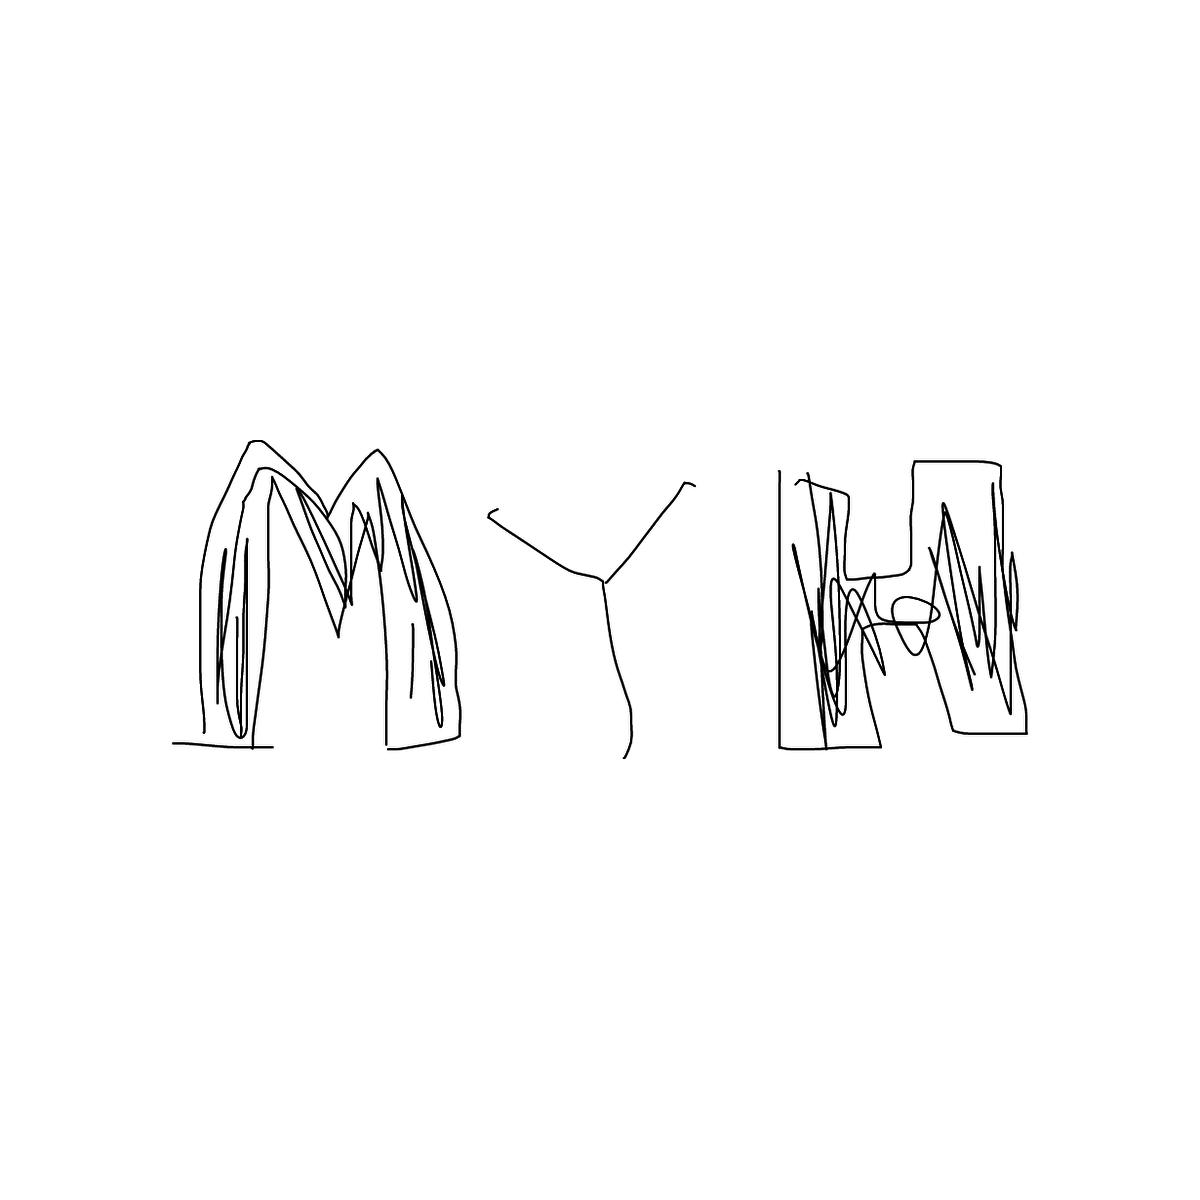 BAAAM drawing#22332 lat:40.5927238464355500lng: -73.9584197998046900